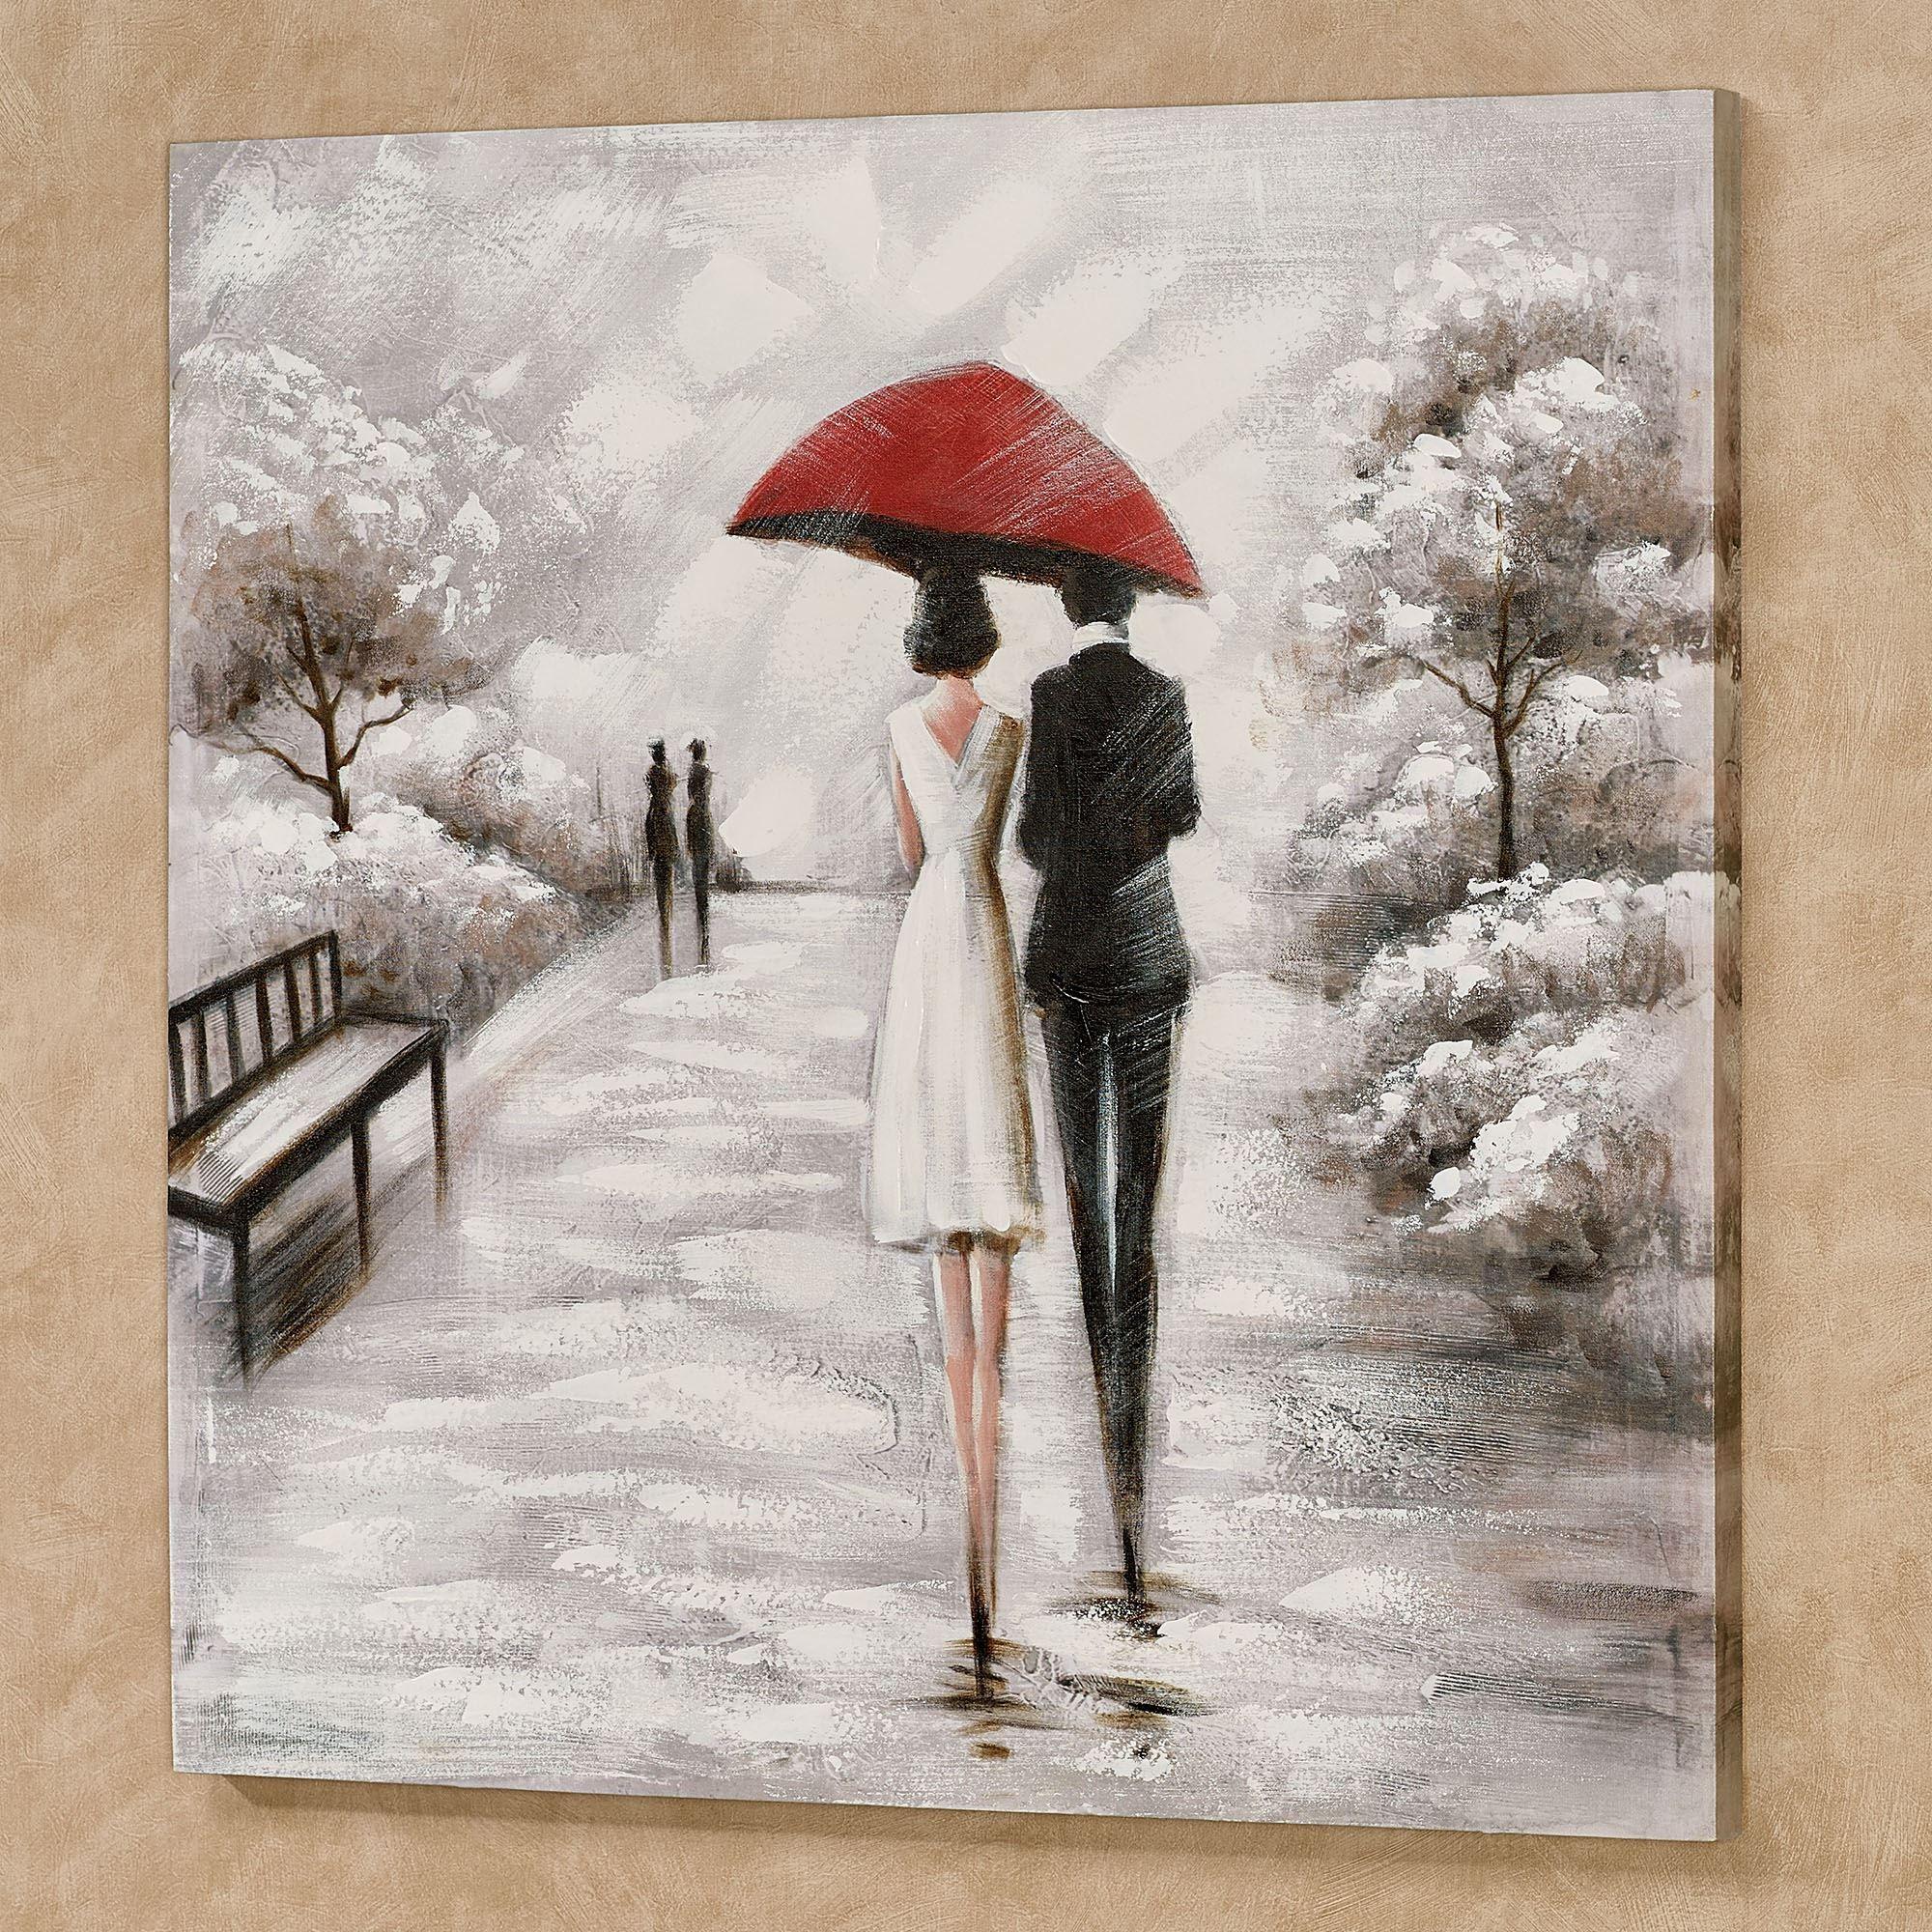 And Black White Umbrella Outdoor